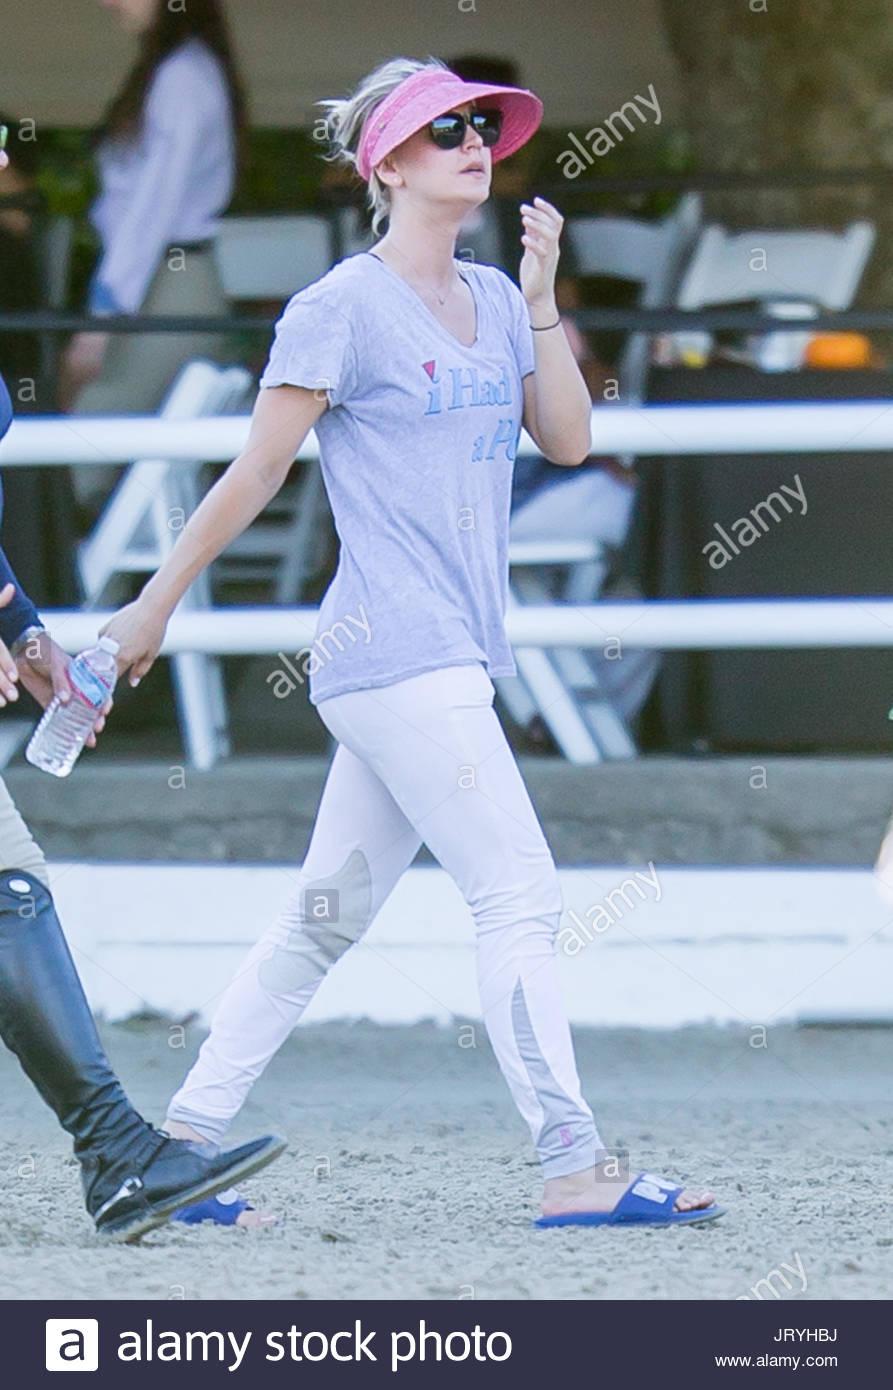 Kaley Cuoco. Kaley Cuoco Seen Without Her Wedding Ring As She Walks The  Equestrian Ring At Flintridge Riding Club In La Canada Flintridge, CA